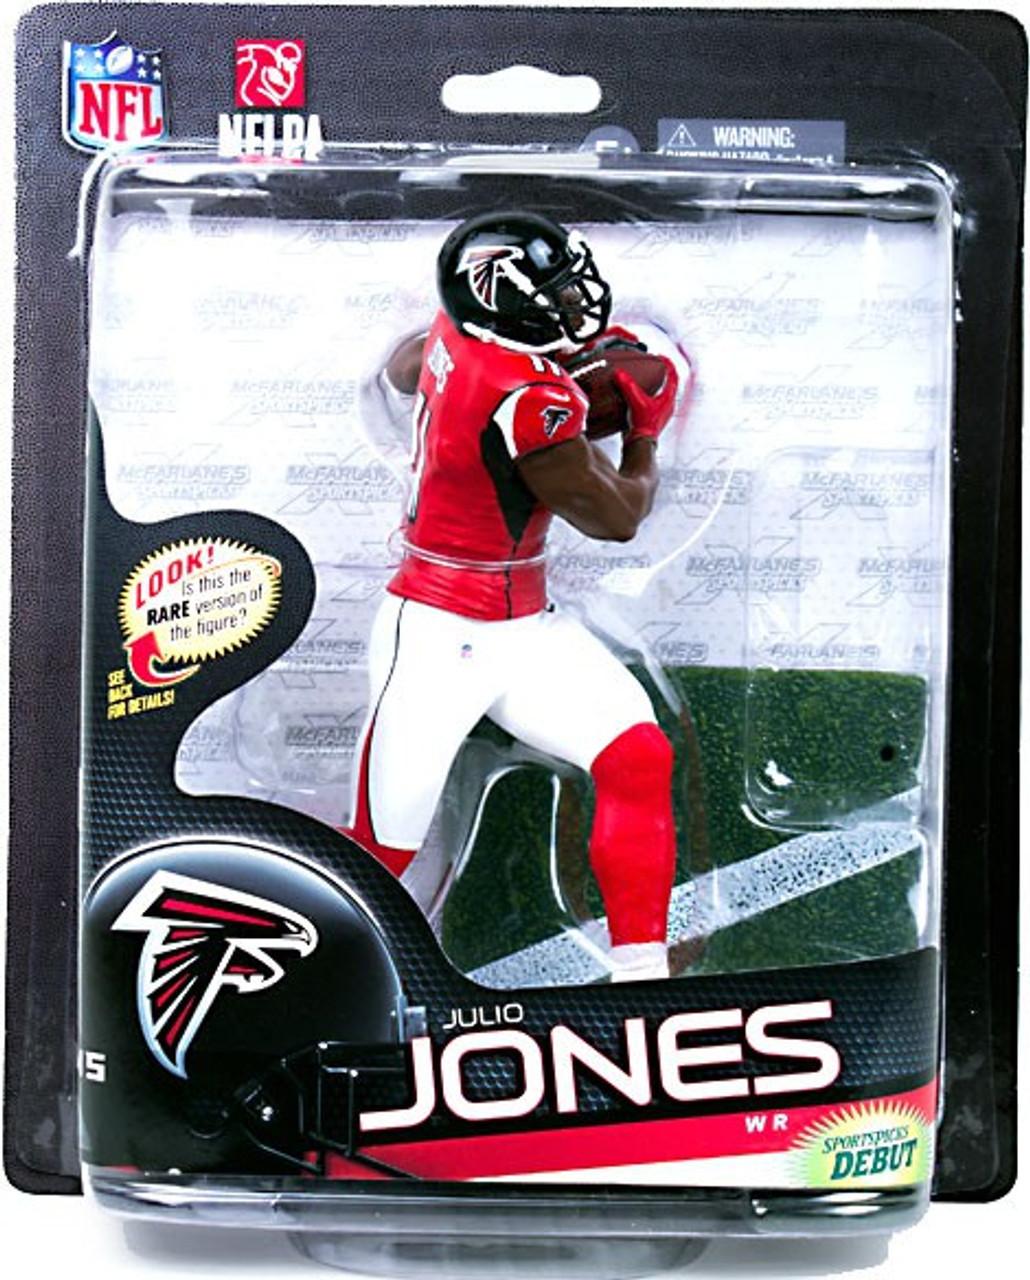 McFarlane Toys NFL Atlanta Falcons Sports Picks Series 33 Julio Jones Action Figure [Red Jersey]